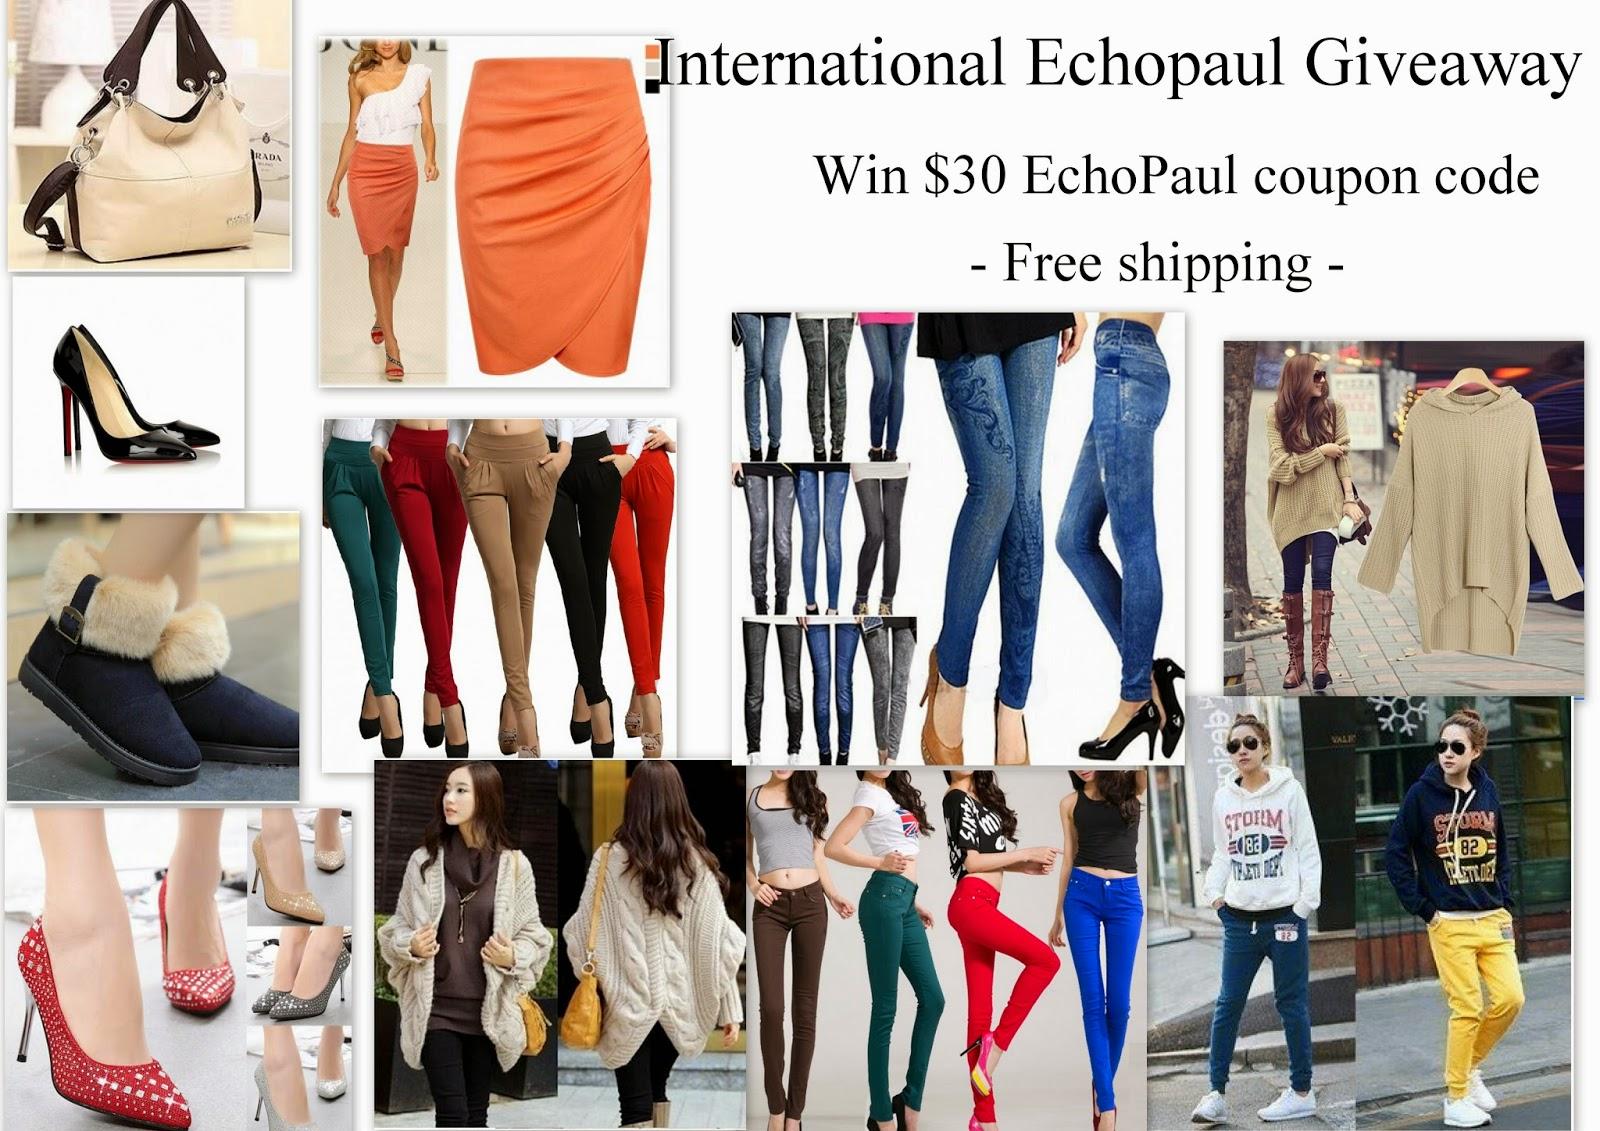 http://www.echopaul.com/womens-apparel.html